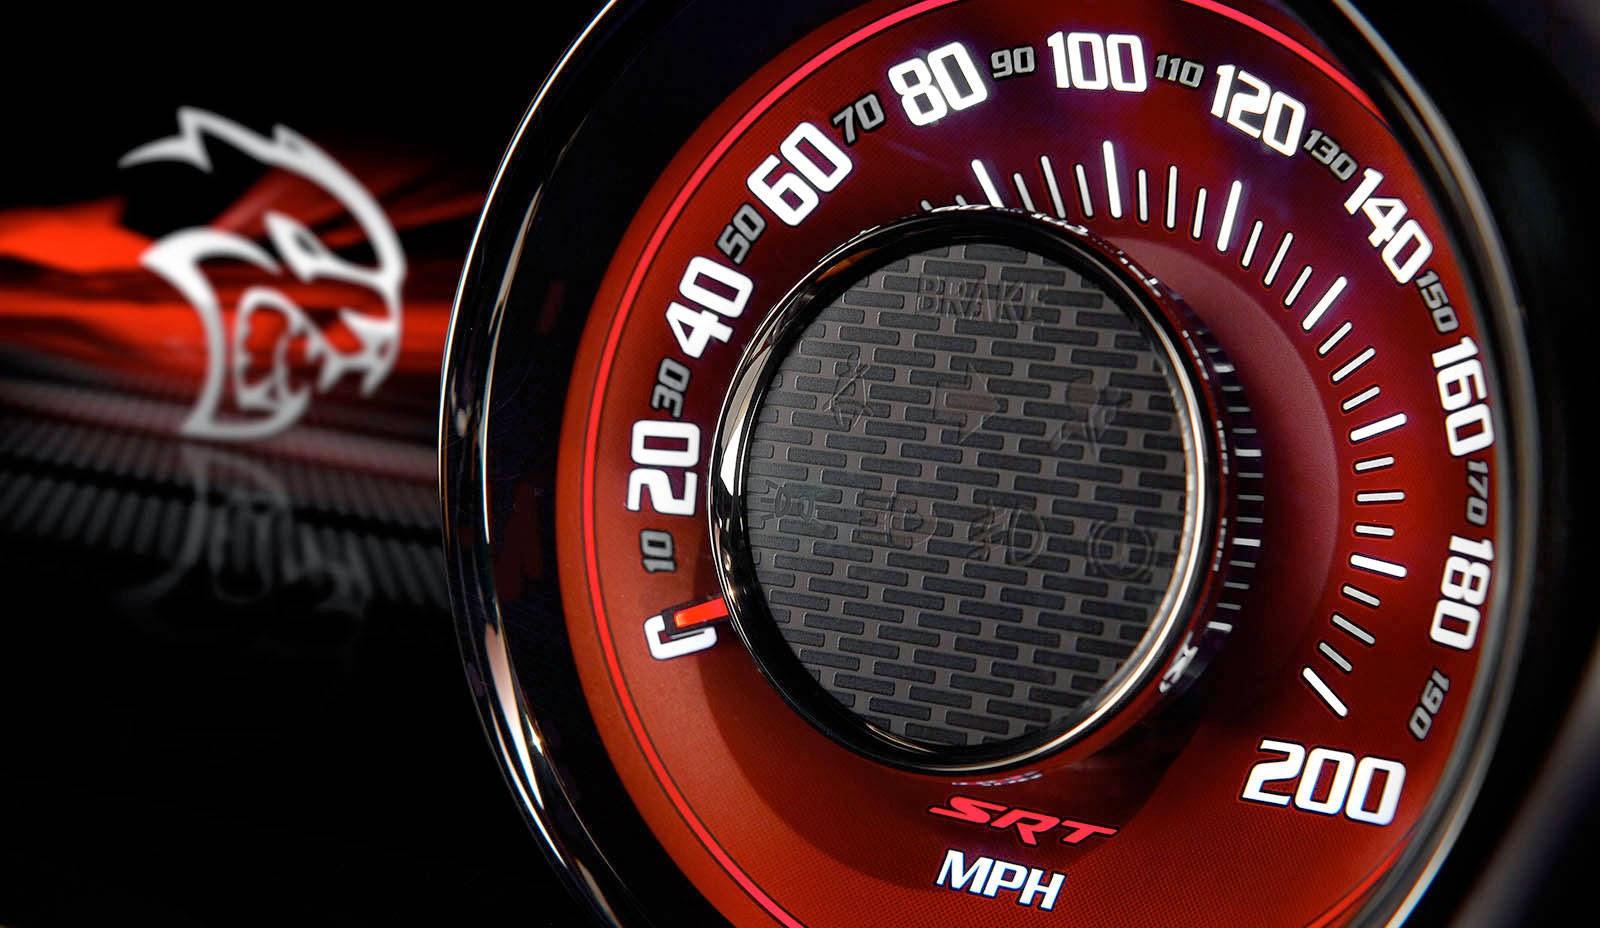 Landmark Dodge Chrysler Jeep Ram: 2015 Challenger SRT Hellcat roars with Popular Mechanics Car Award